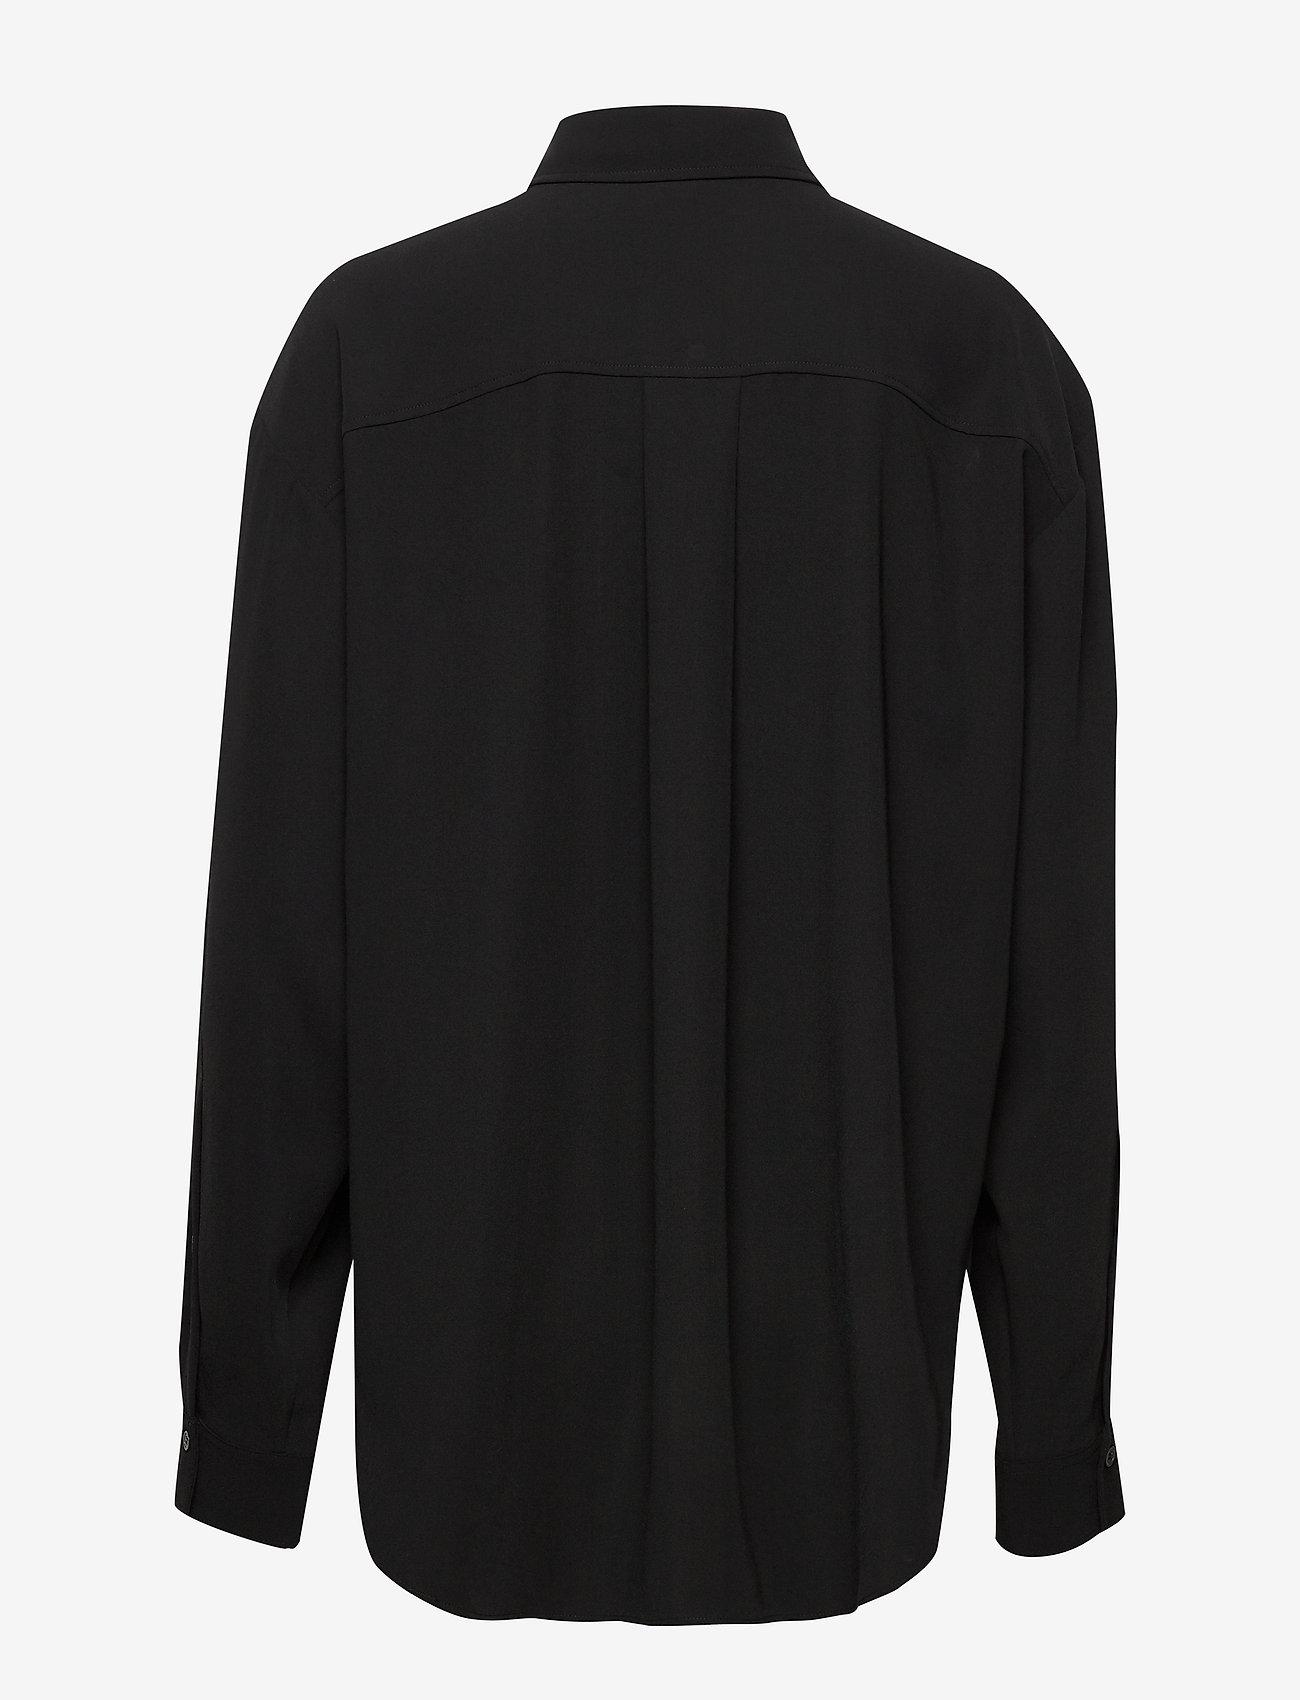 Totême - LAGO - long-sleeved shirts - black crepe 200